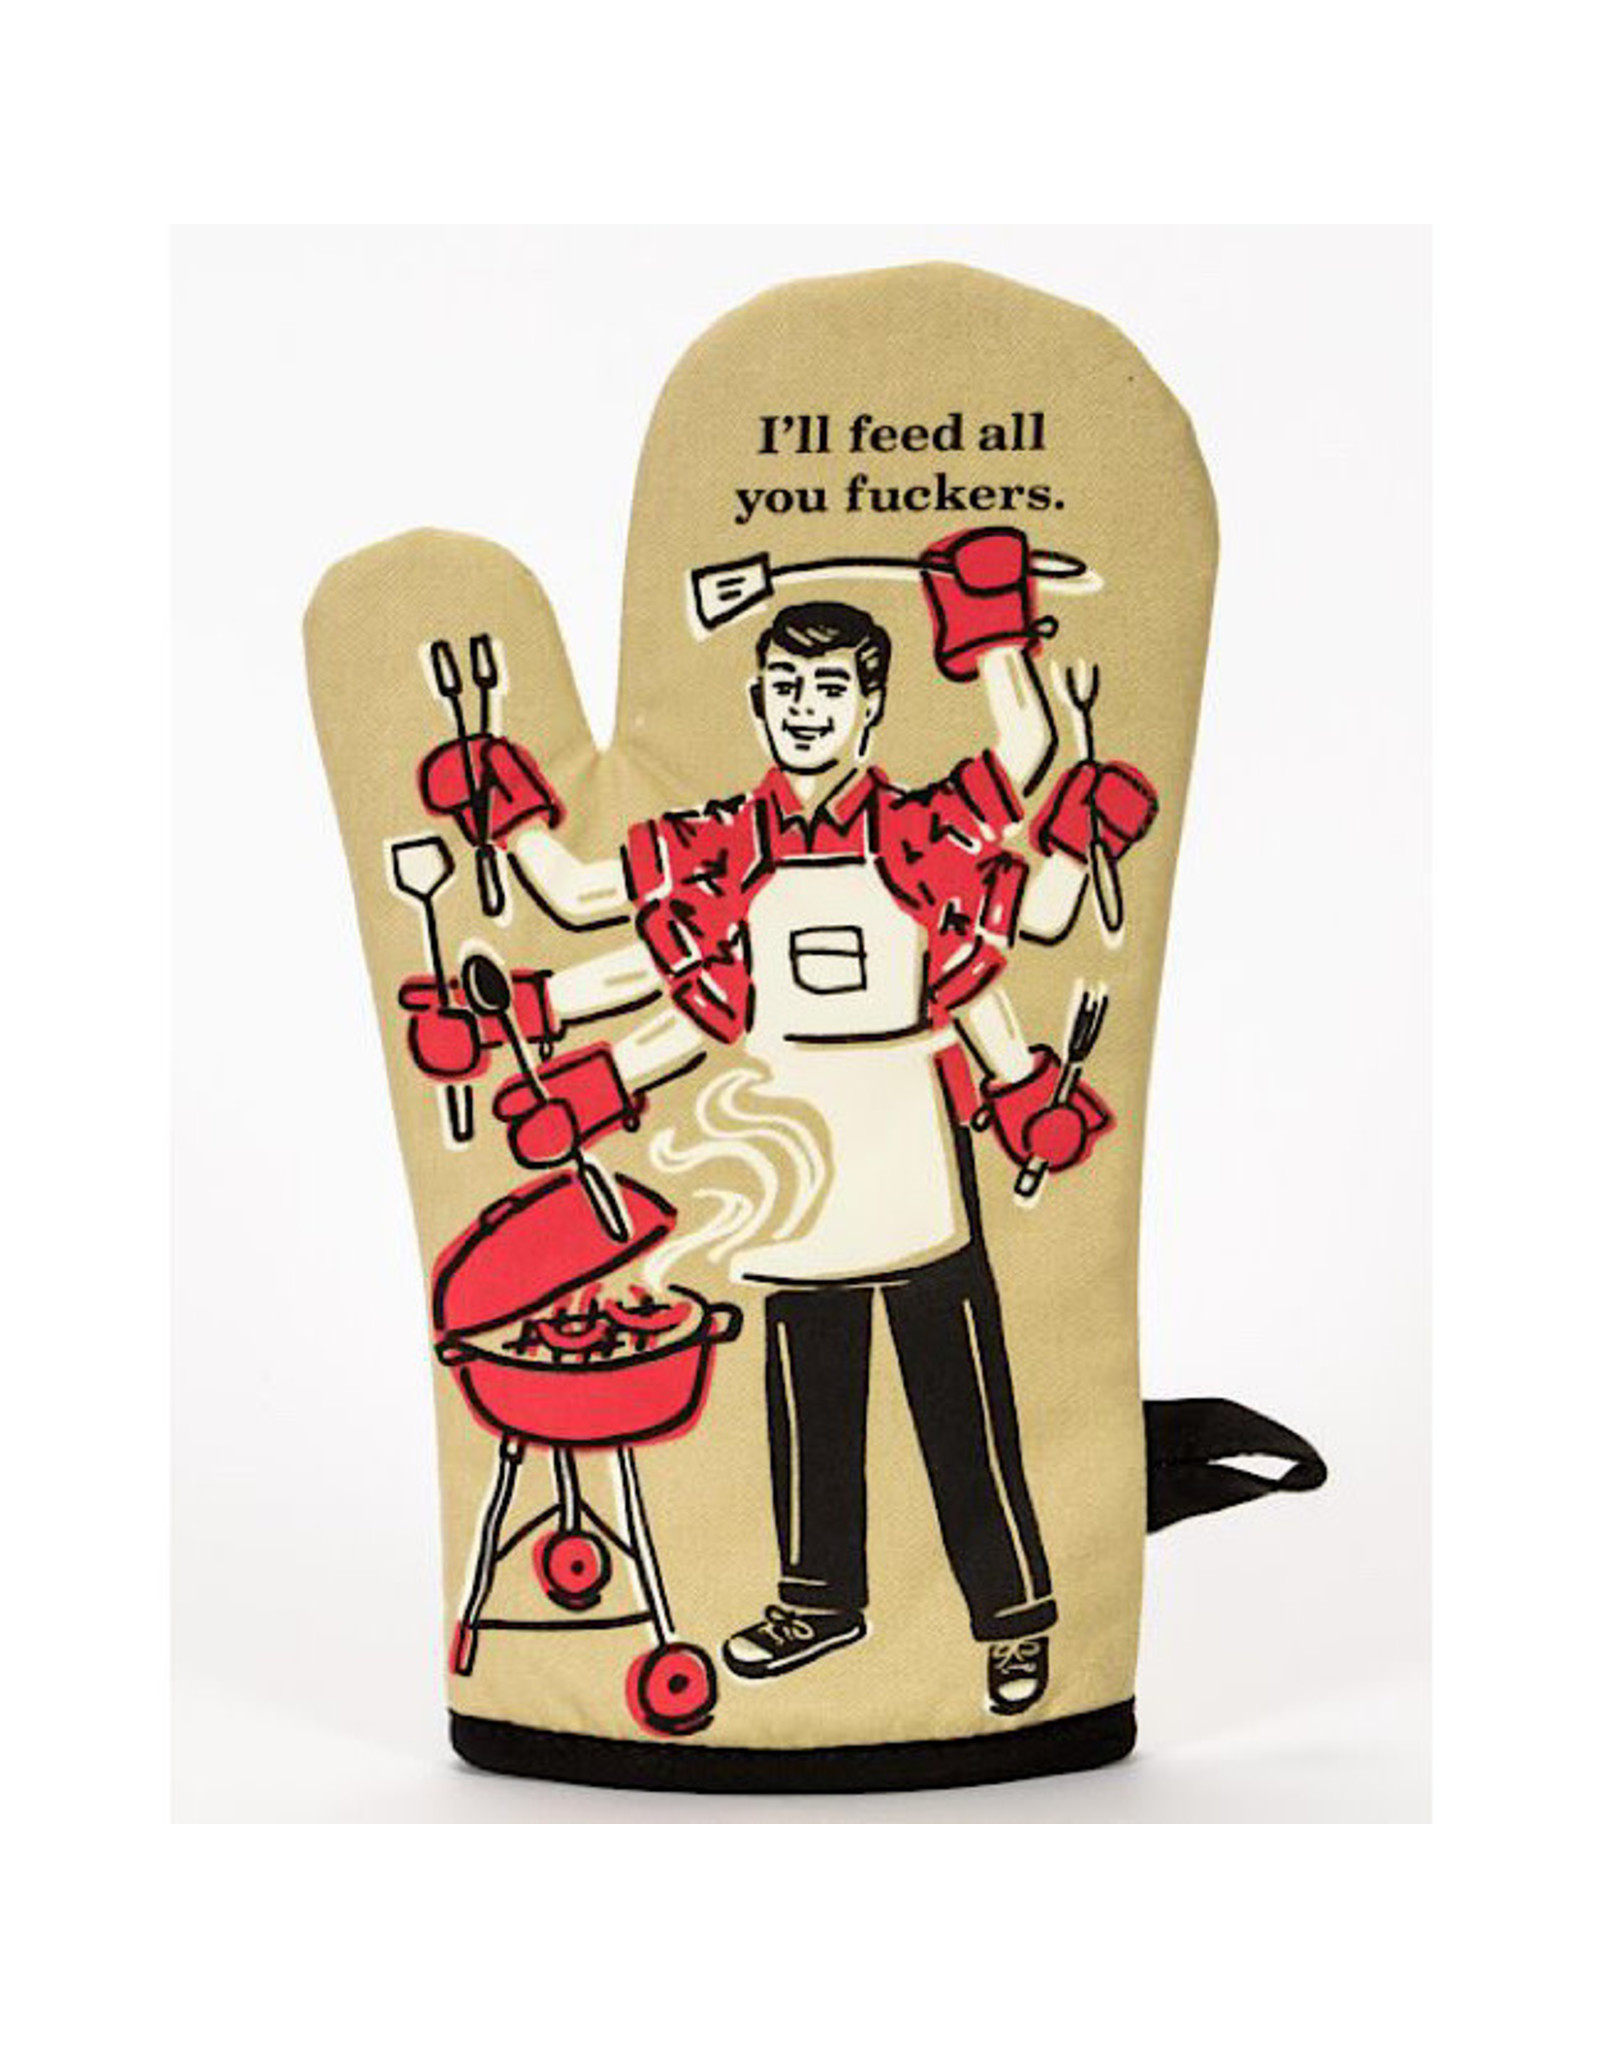 Oven Mitt - I'll Feed All You Fuckers